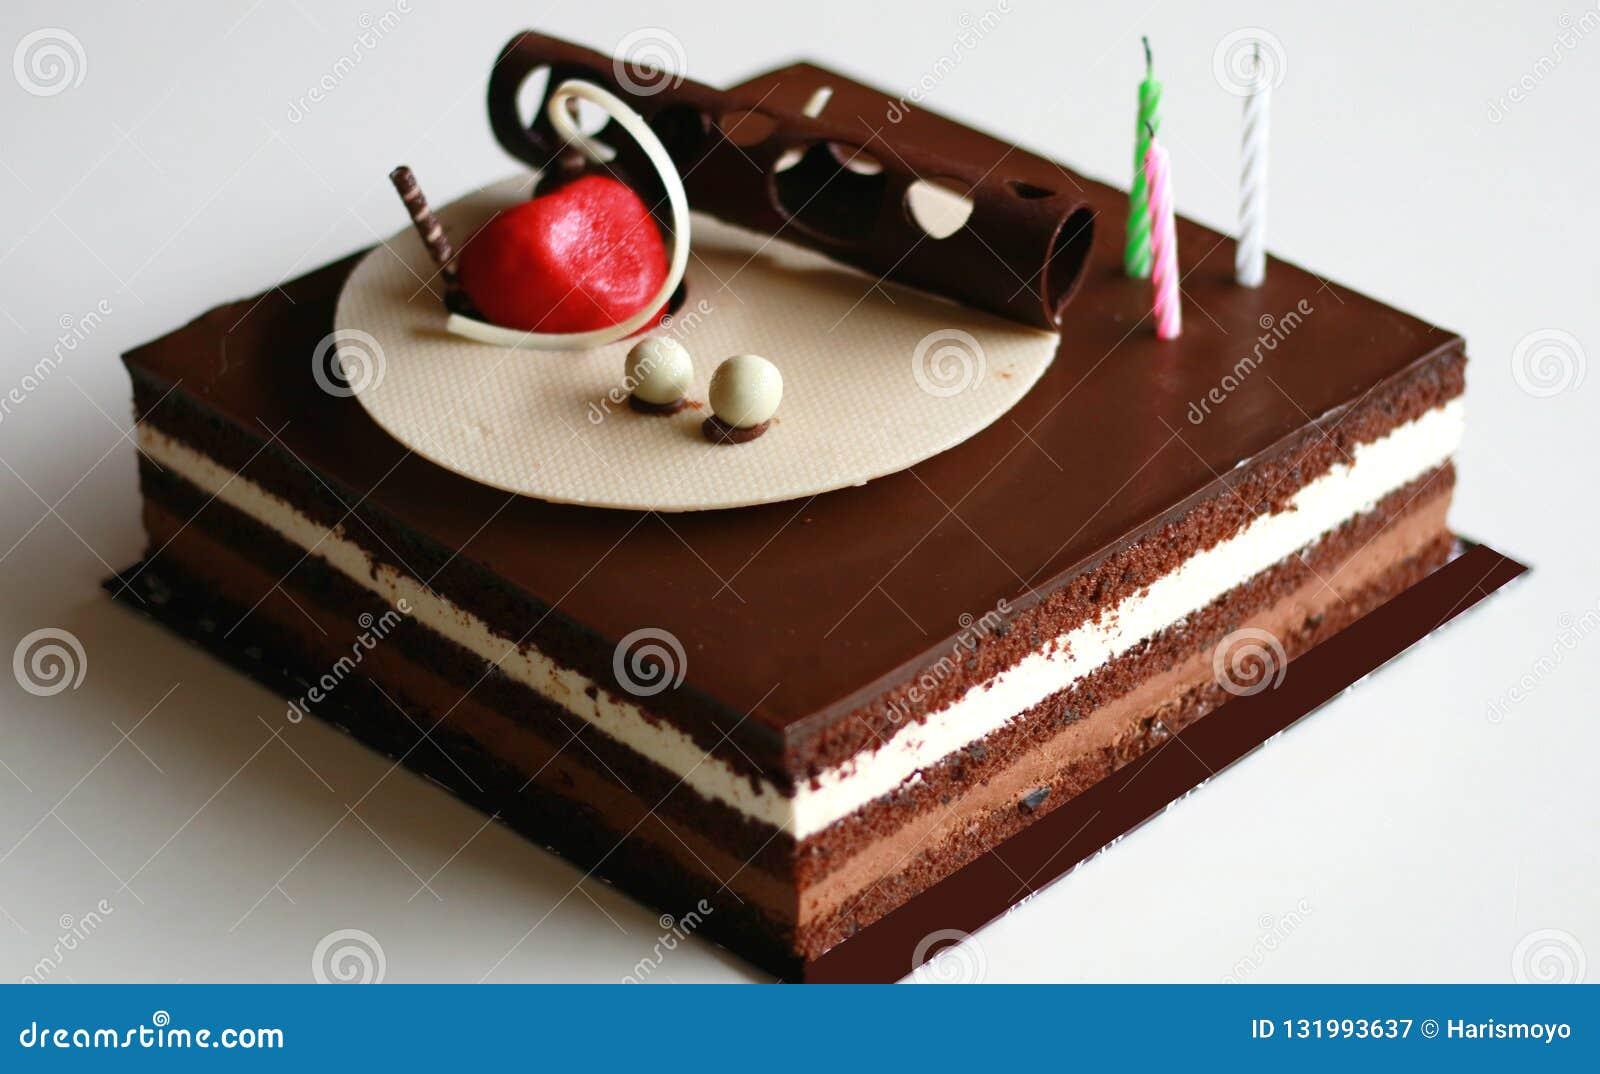 Chocolate Birthday Cake Stock Image Of Plate